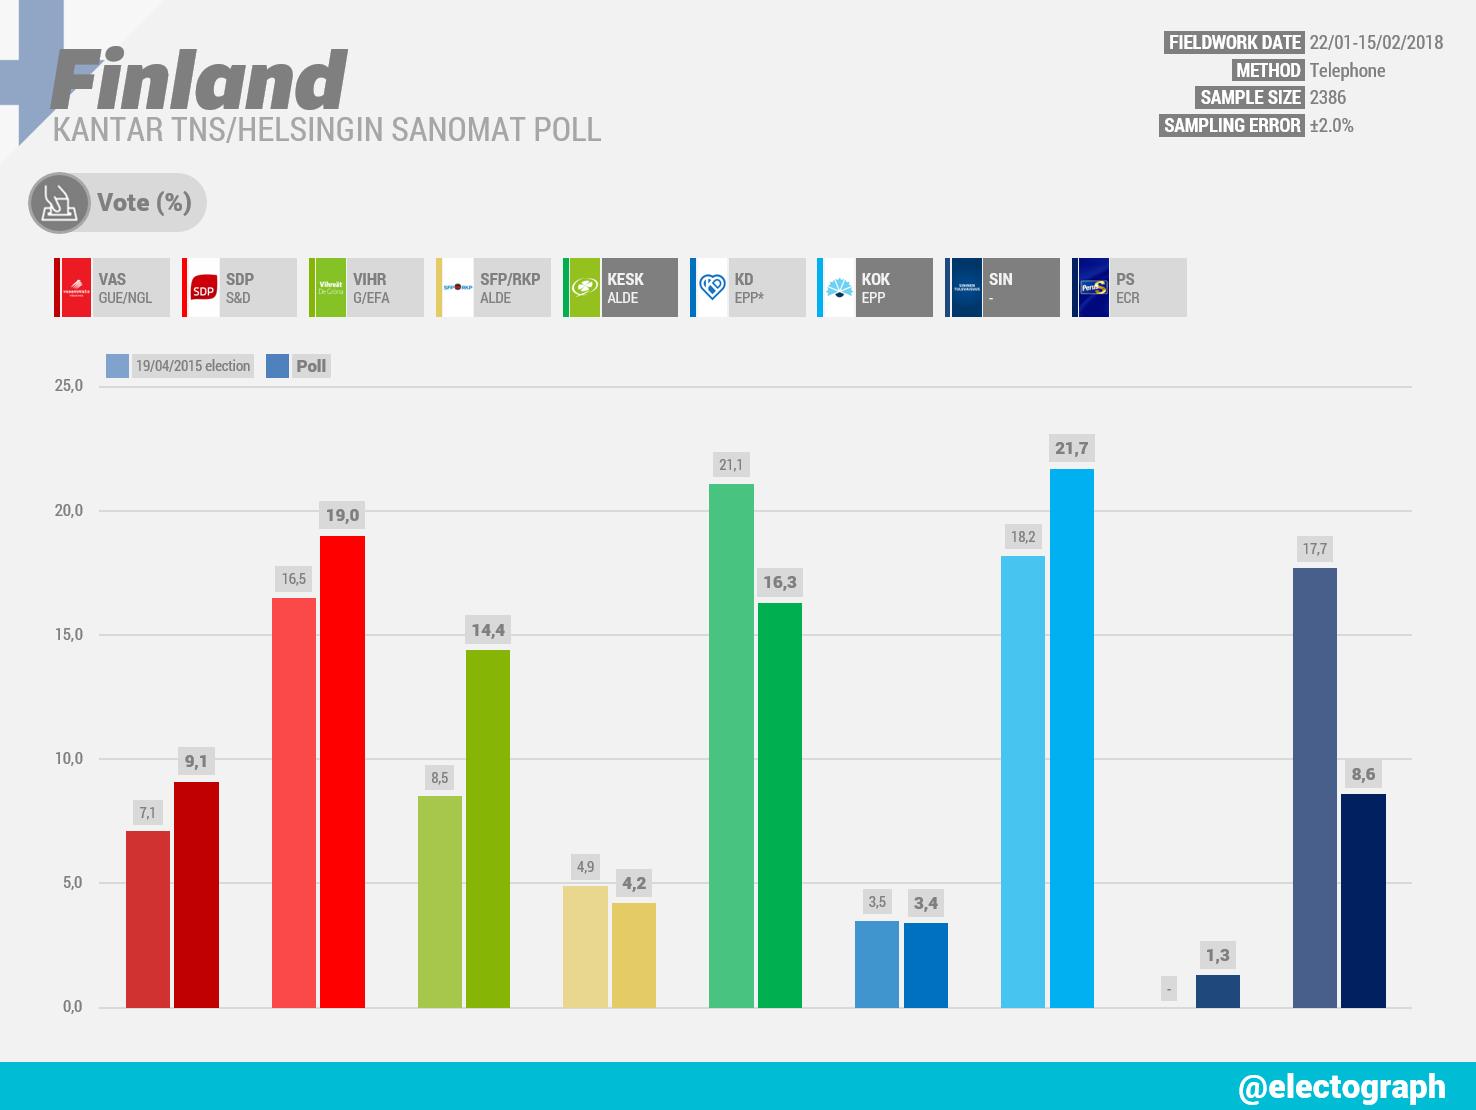 FINLAND Kantar TNS poll chart for Helsingin Sanomat, February 2018